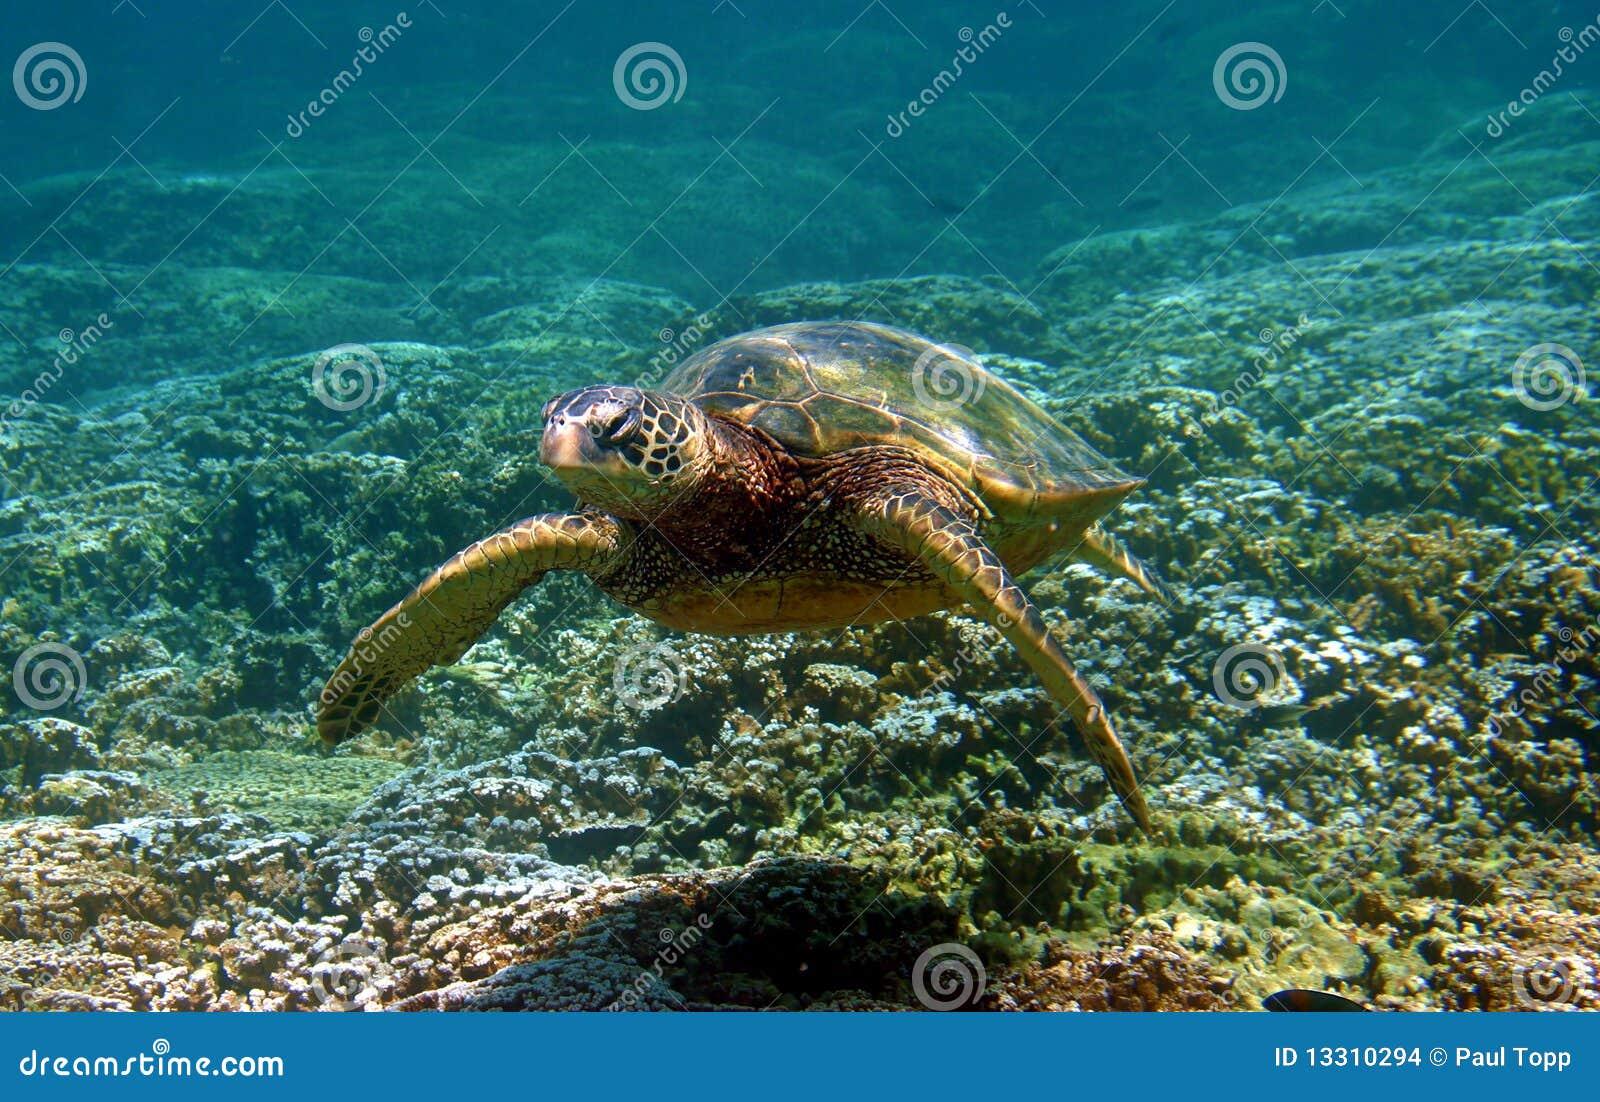 Tortue de mer verte nageant sous l eau en Hawaï